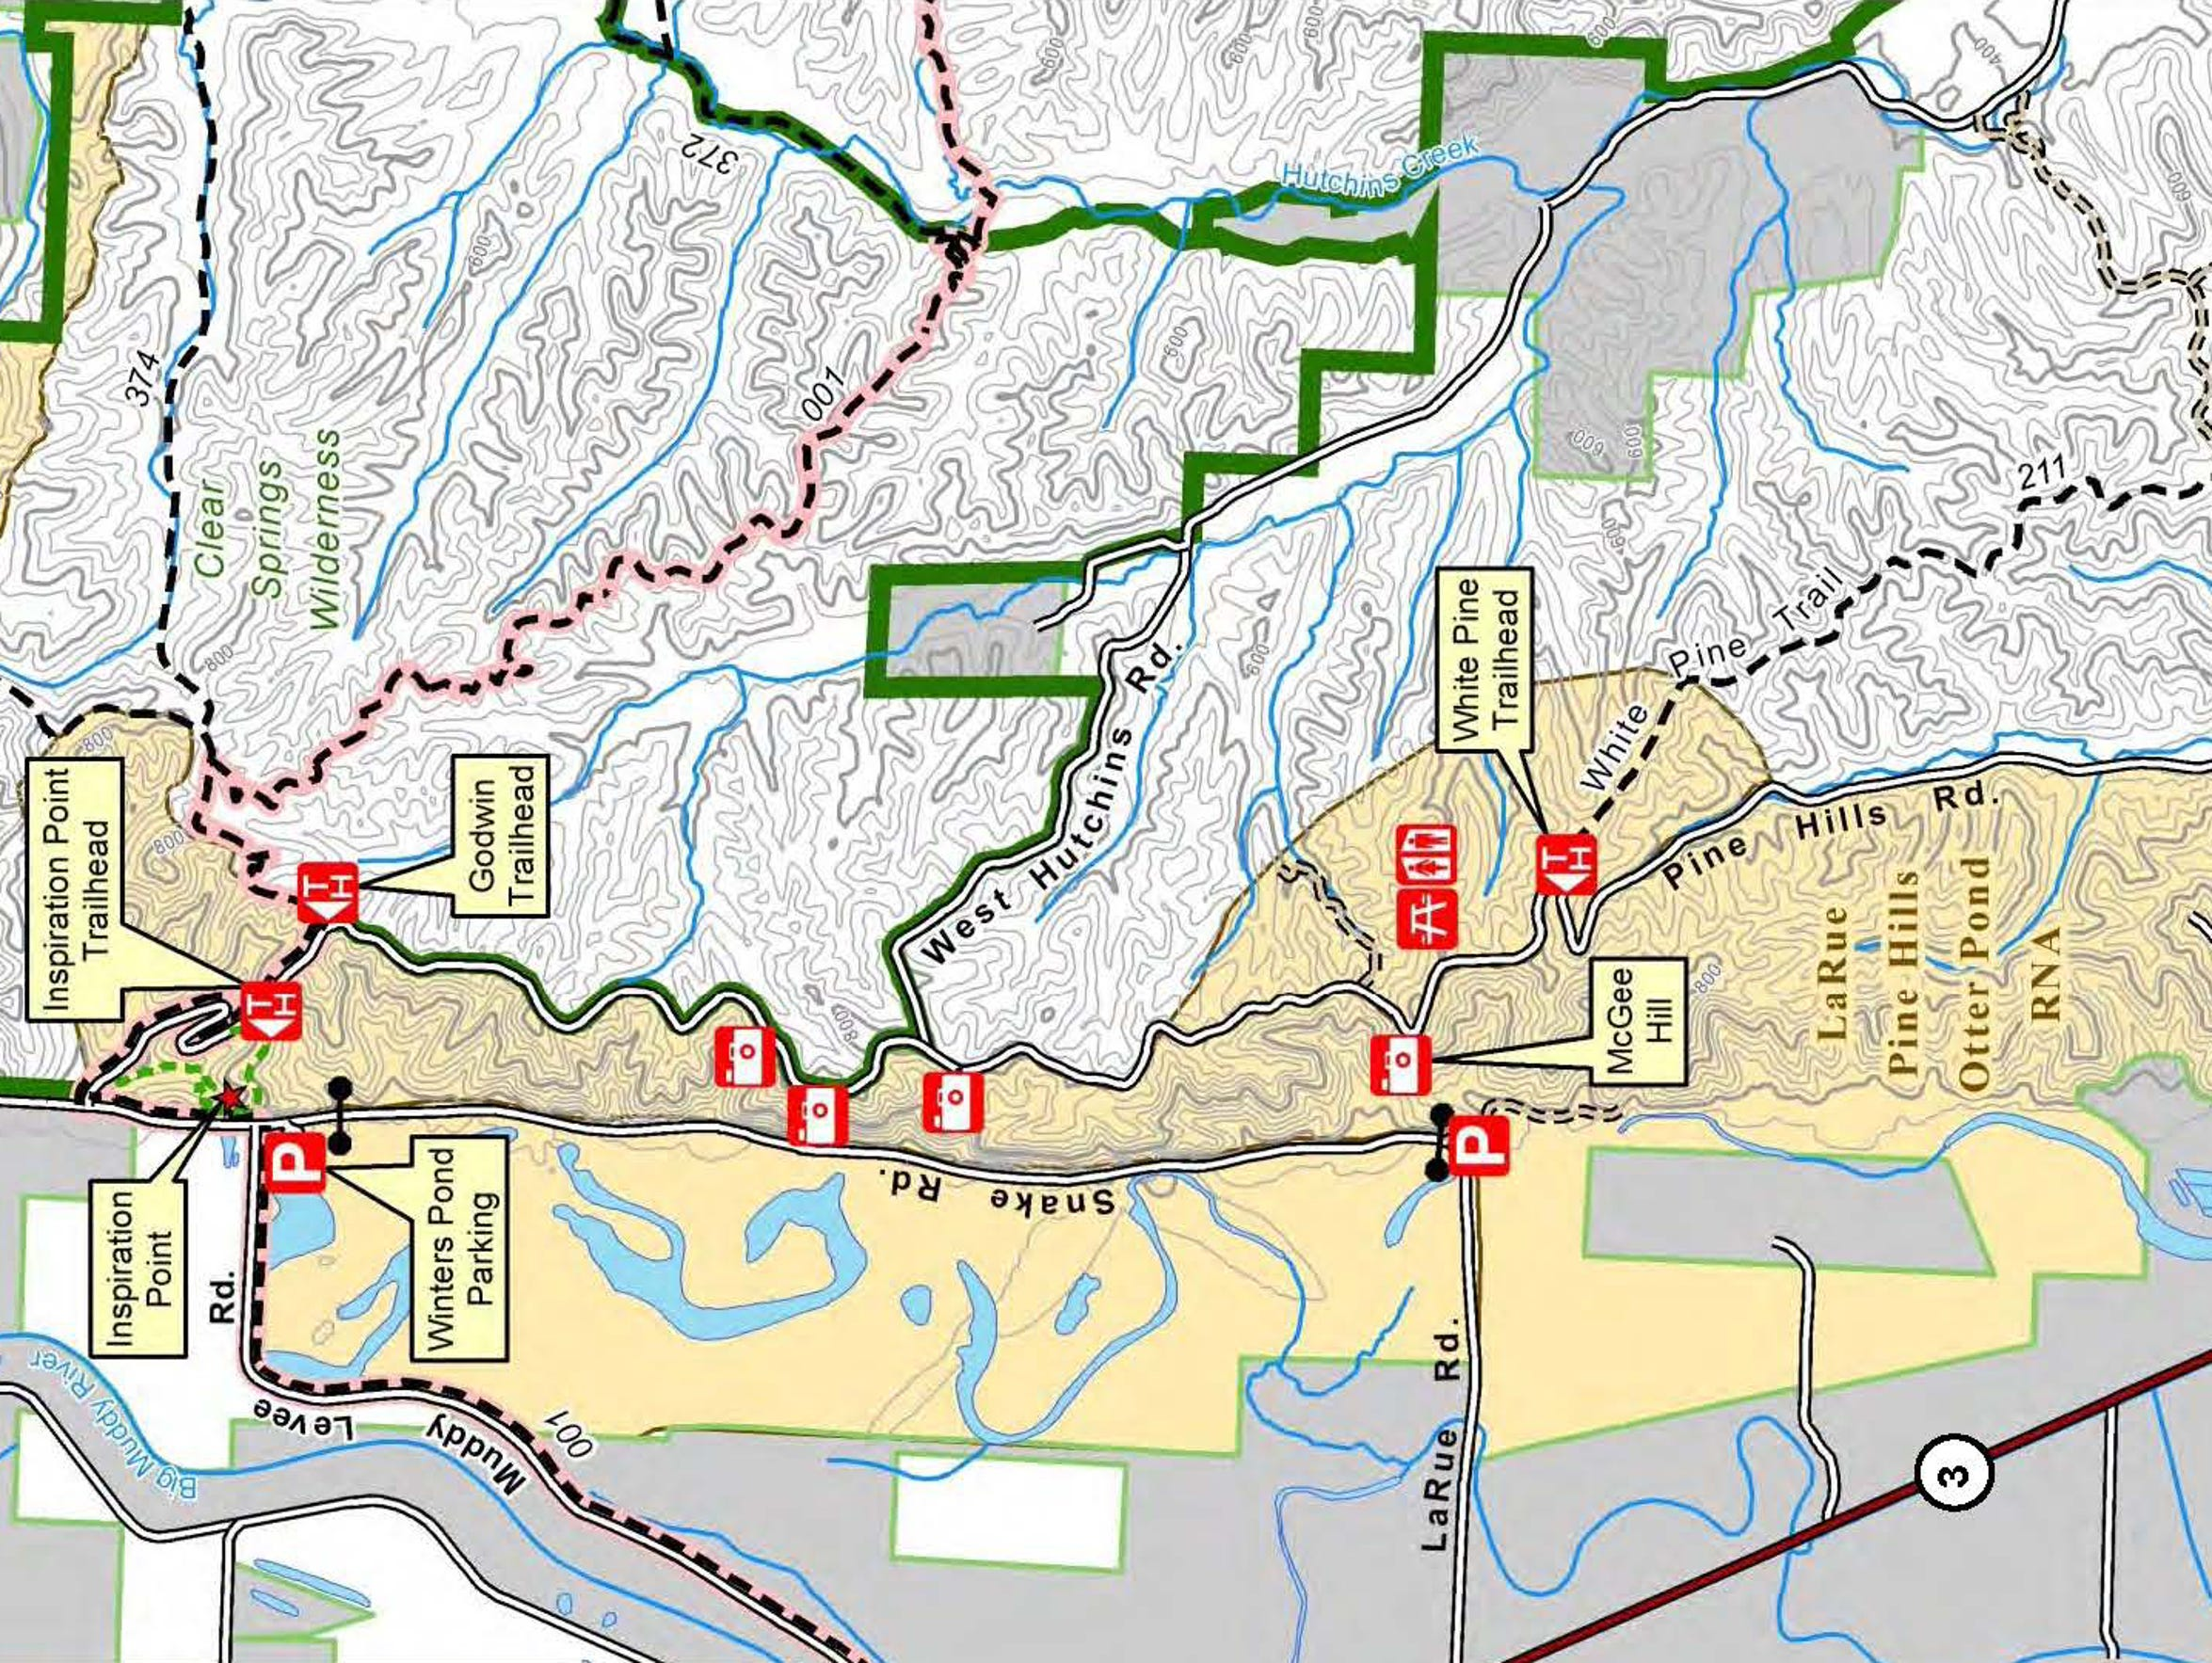 Map of LaRue Pine Hills area